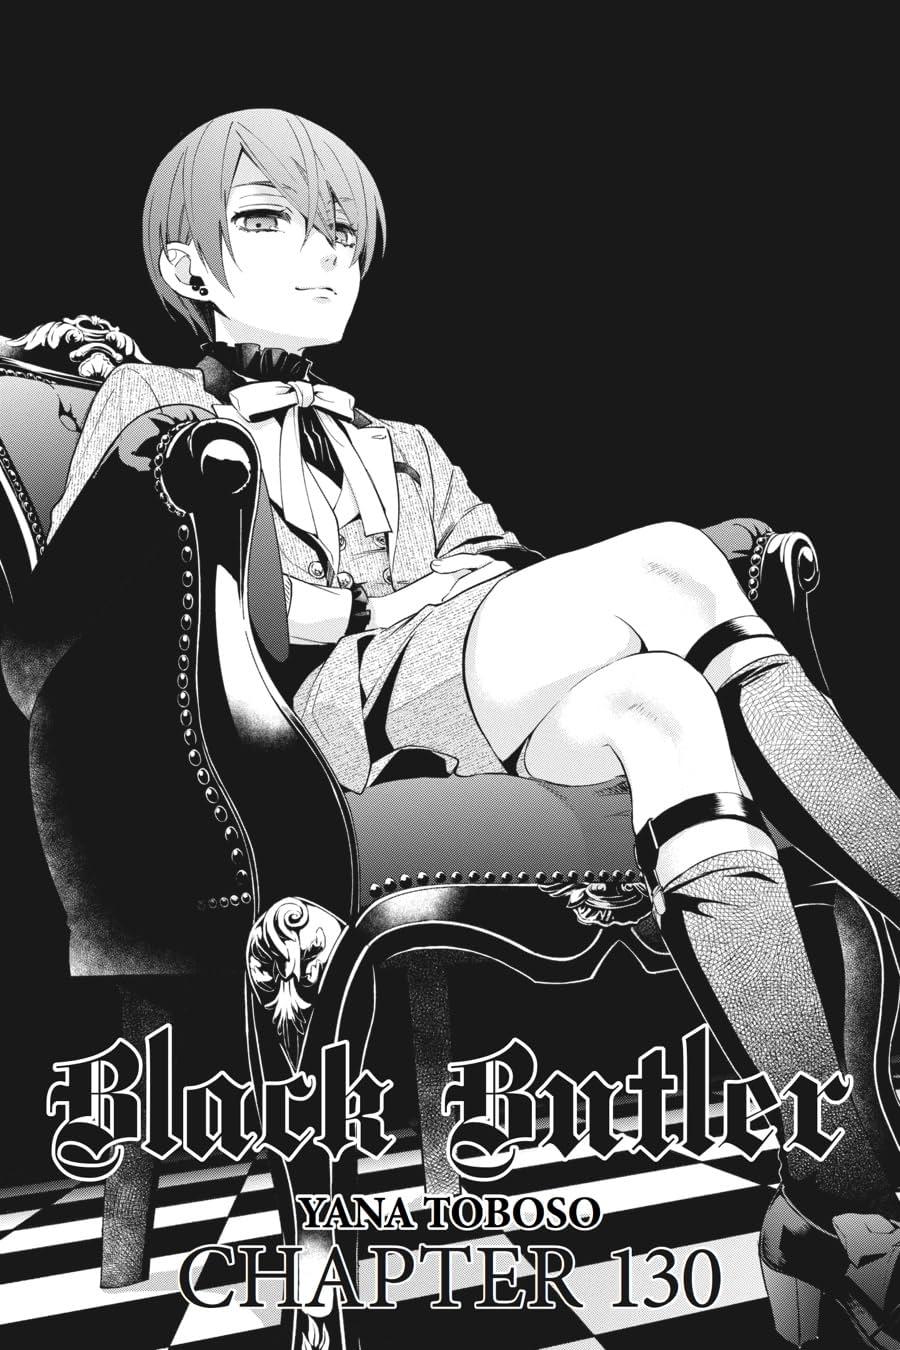 Black Butler #130